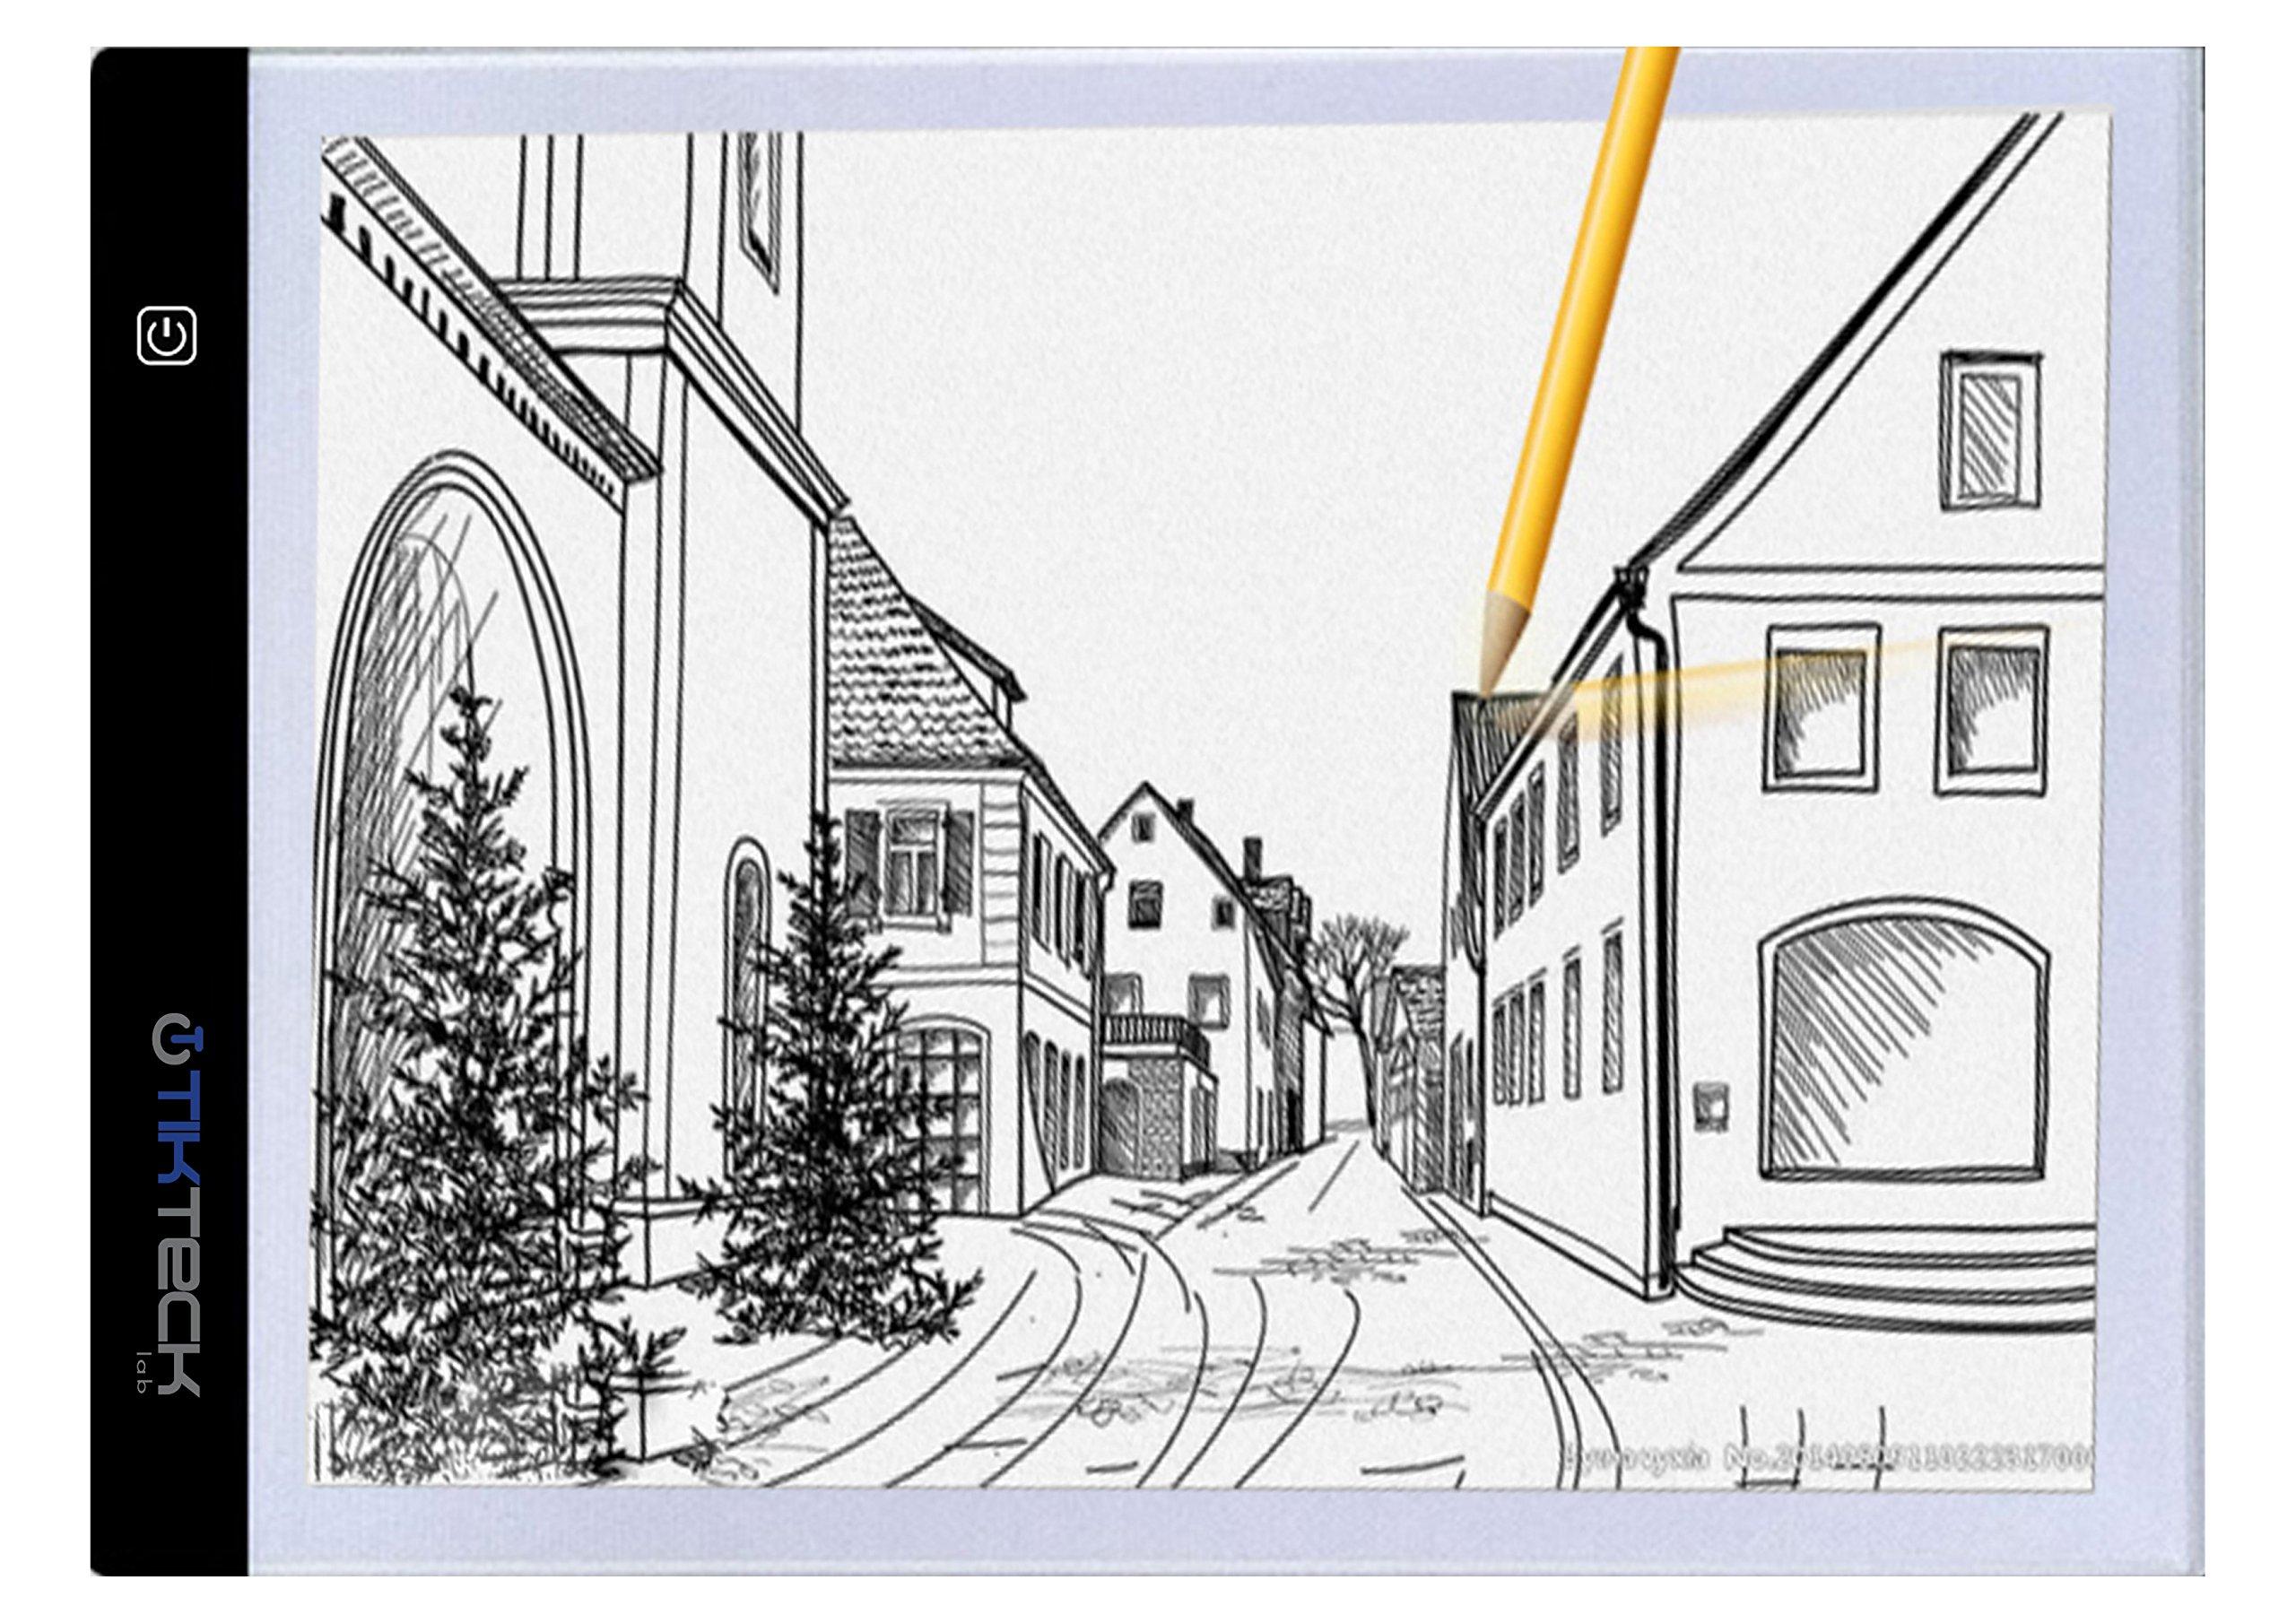 Ultra thin Portable Artcraft Sketching Animation